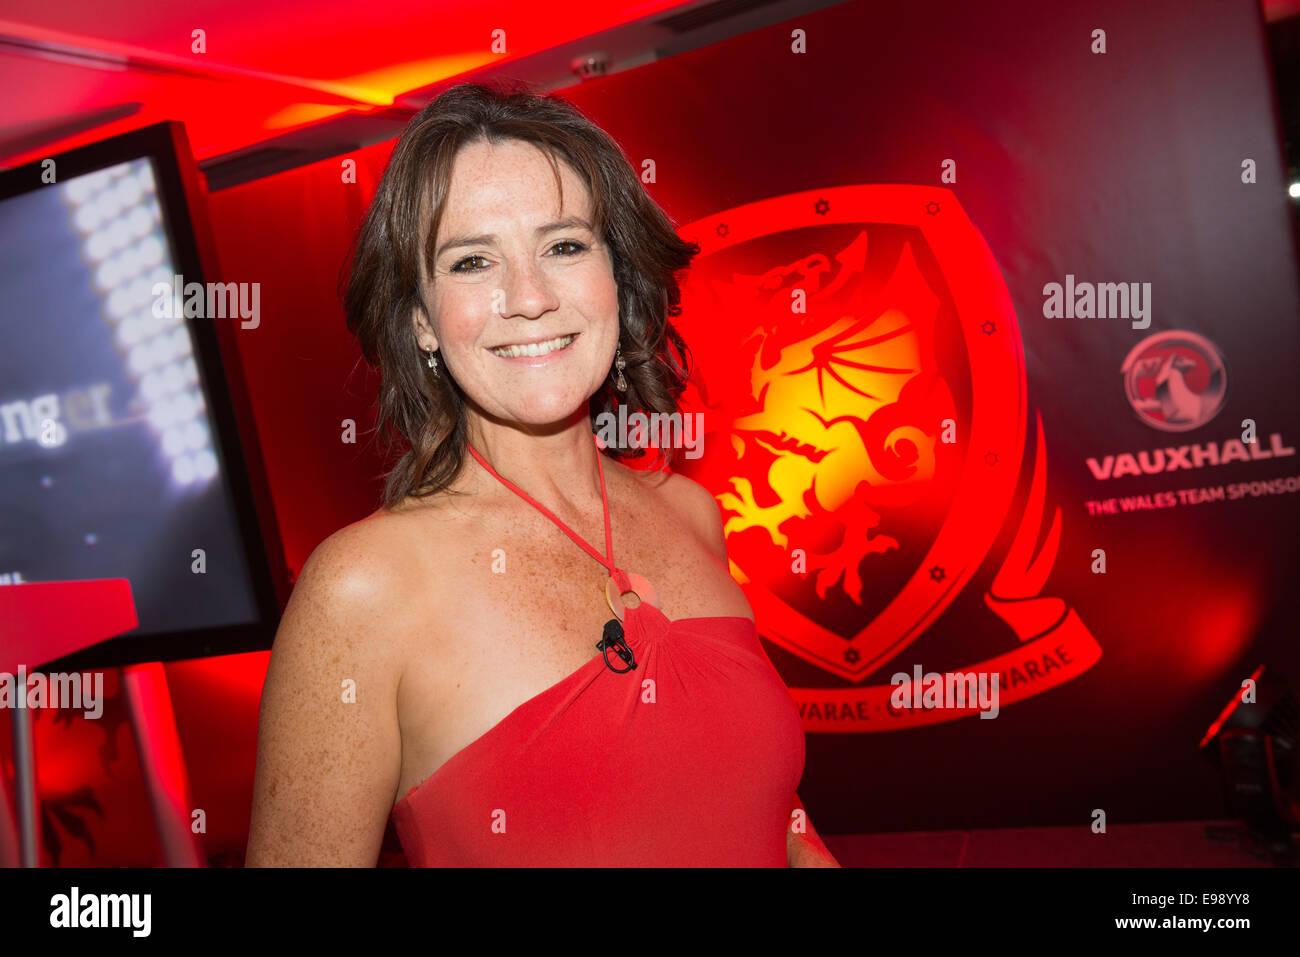 Football Association of Wales Awards Dinner 2014, St David's Hotel, Cardiff. TV presenter Frances Donovan. - Stock Image